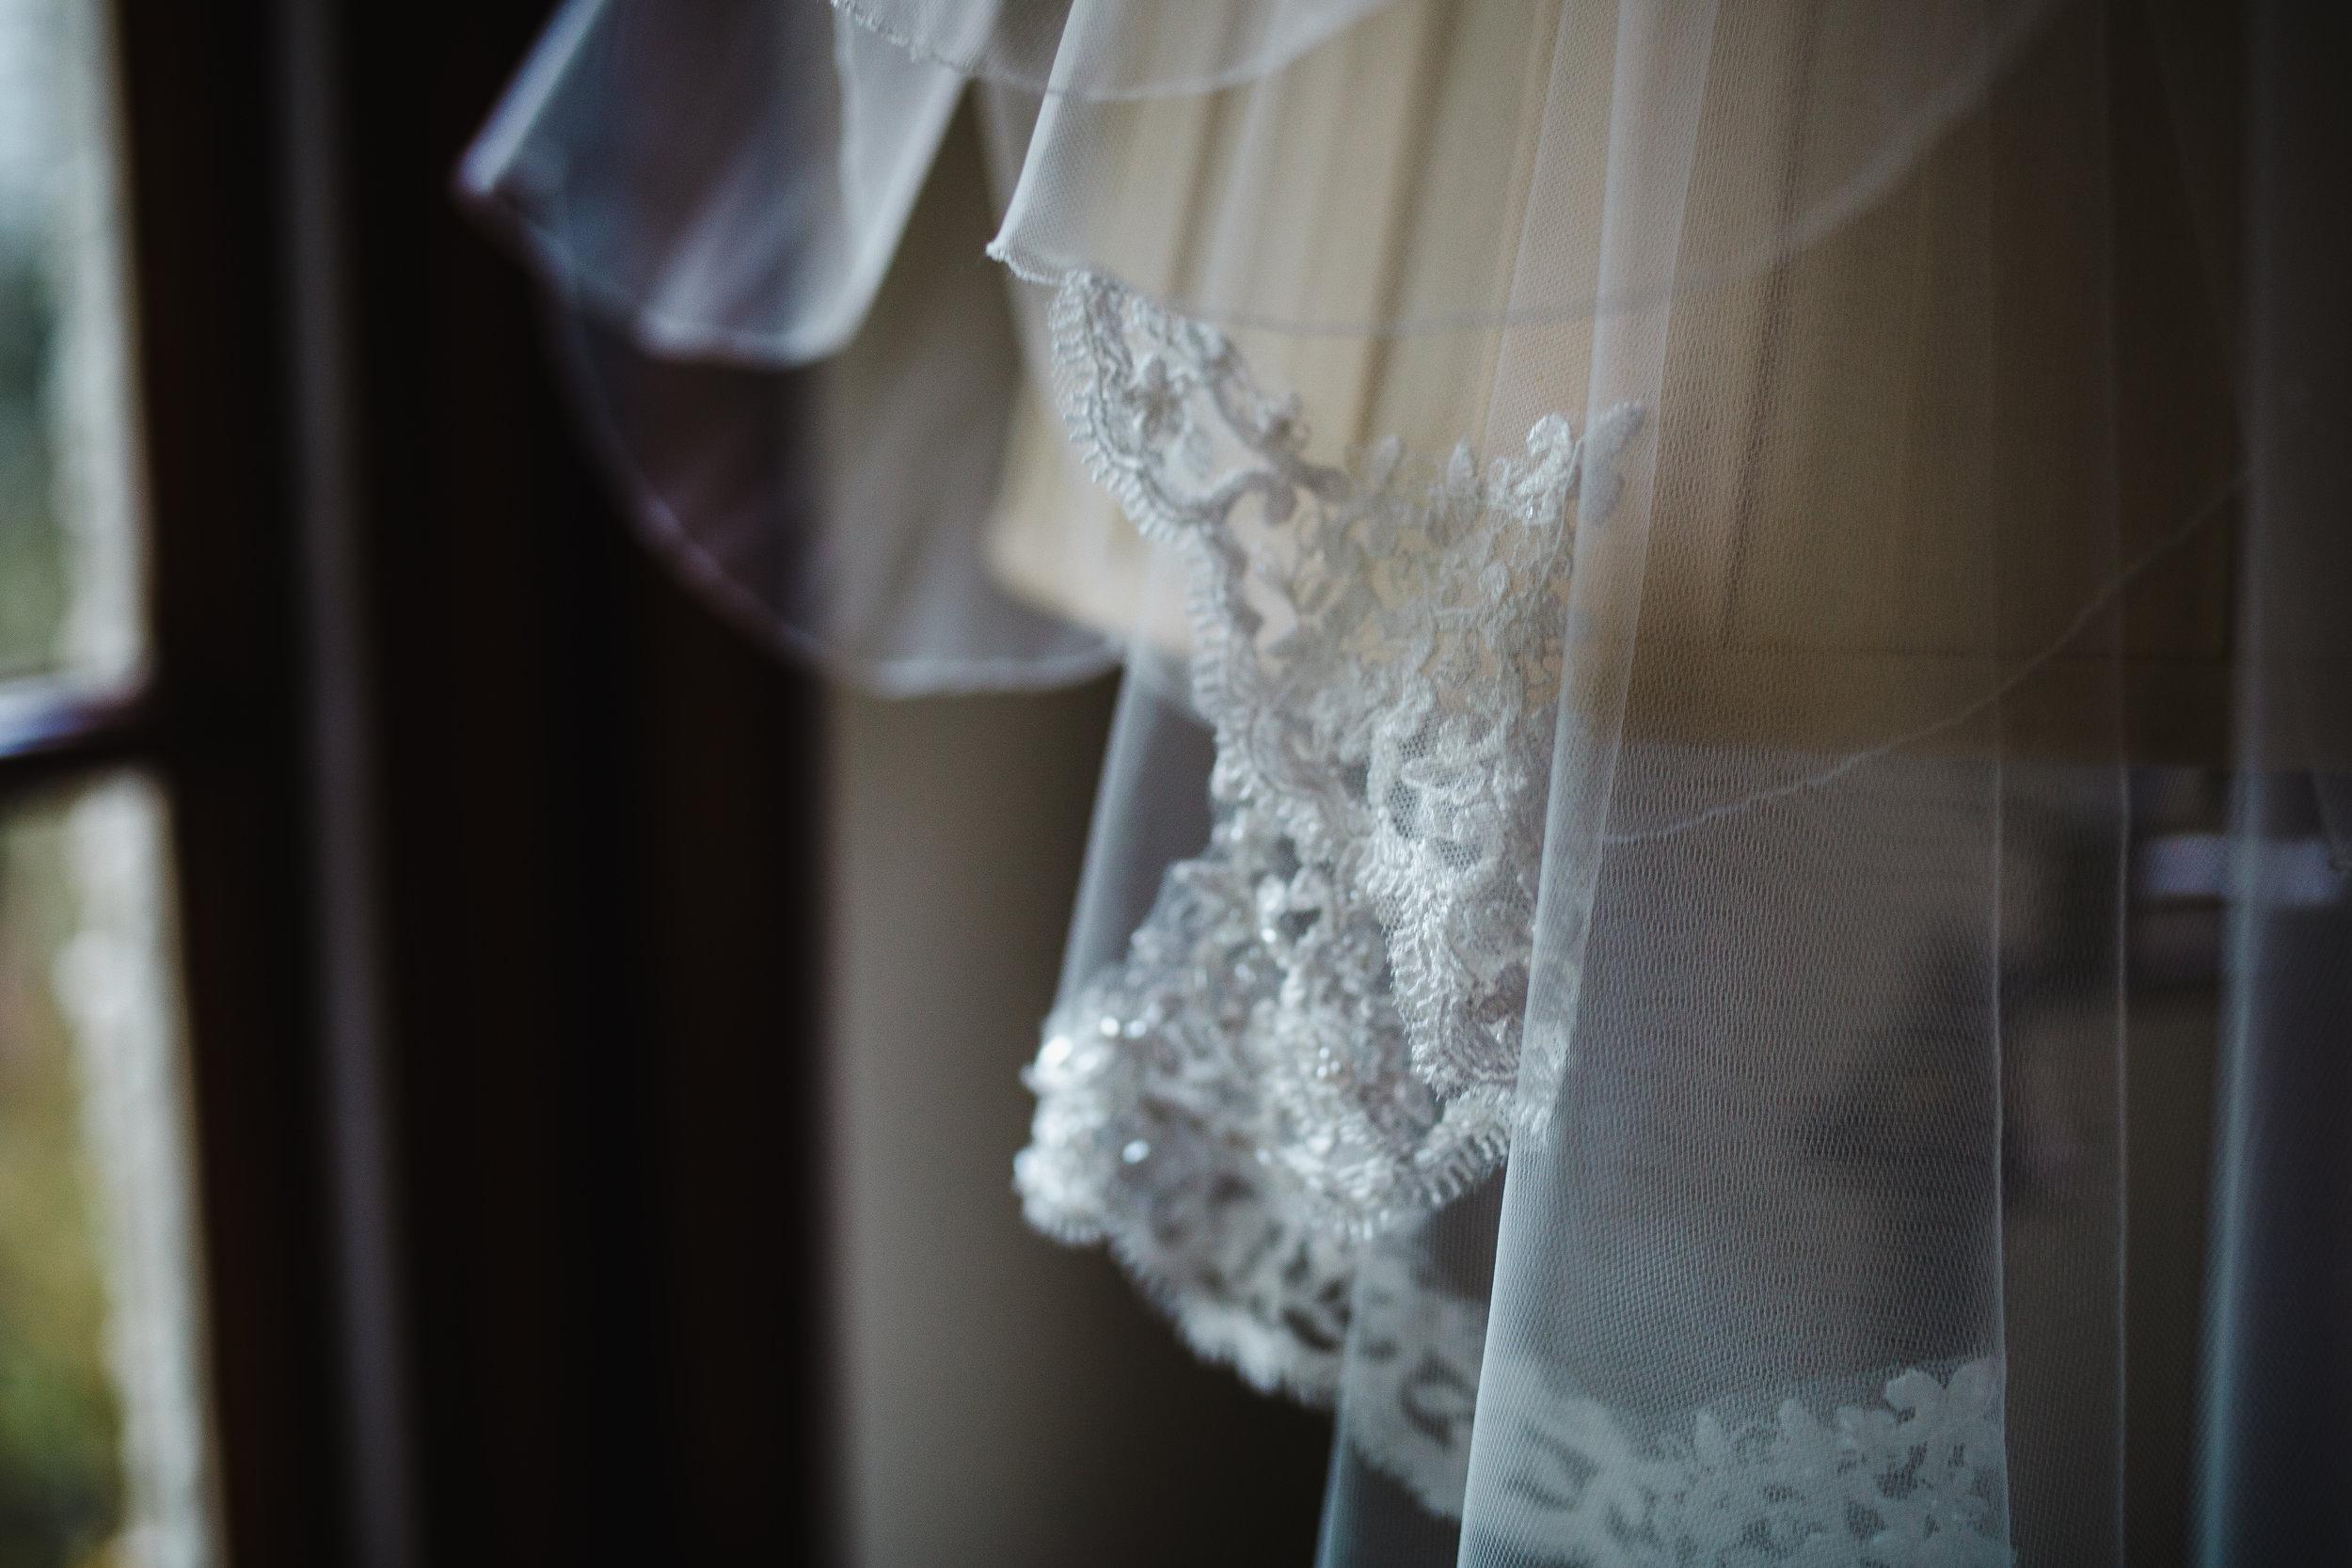 lake district wedding - the veil